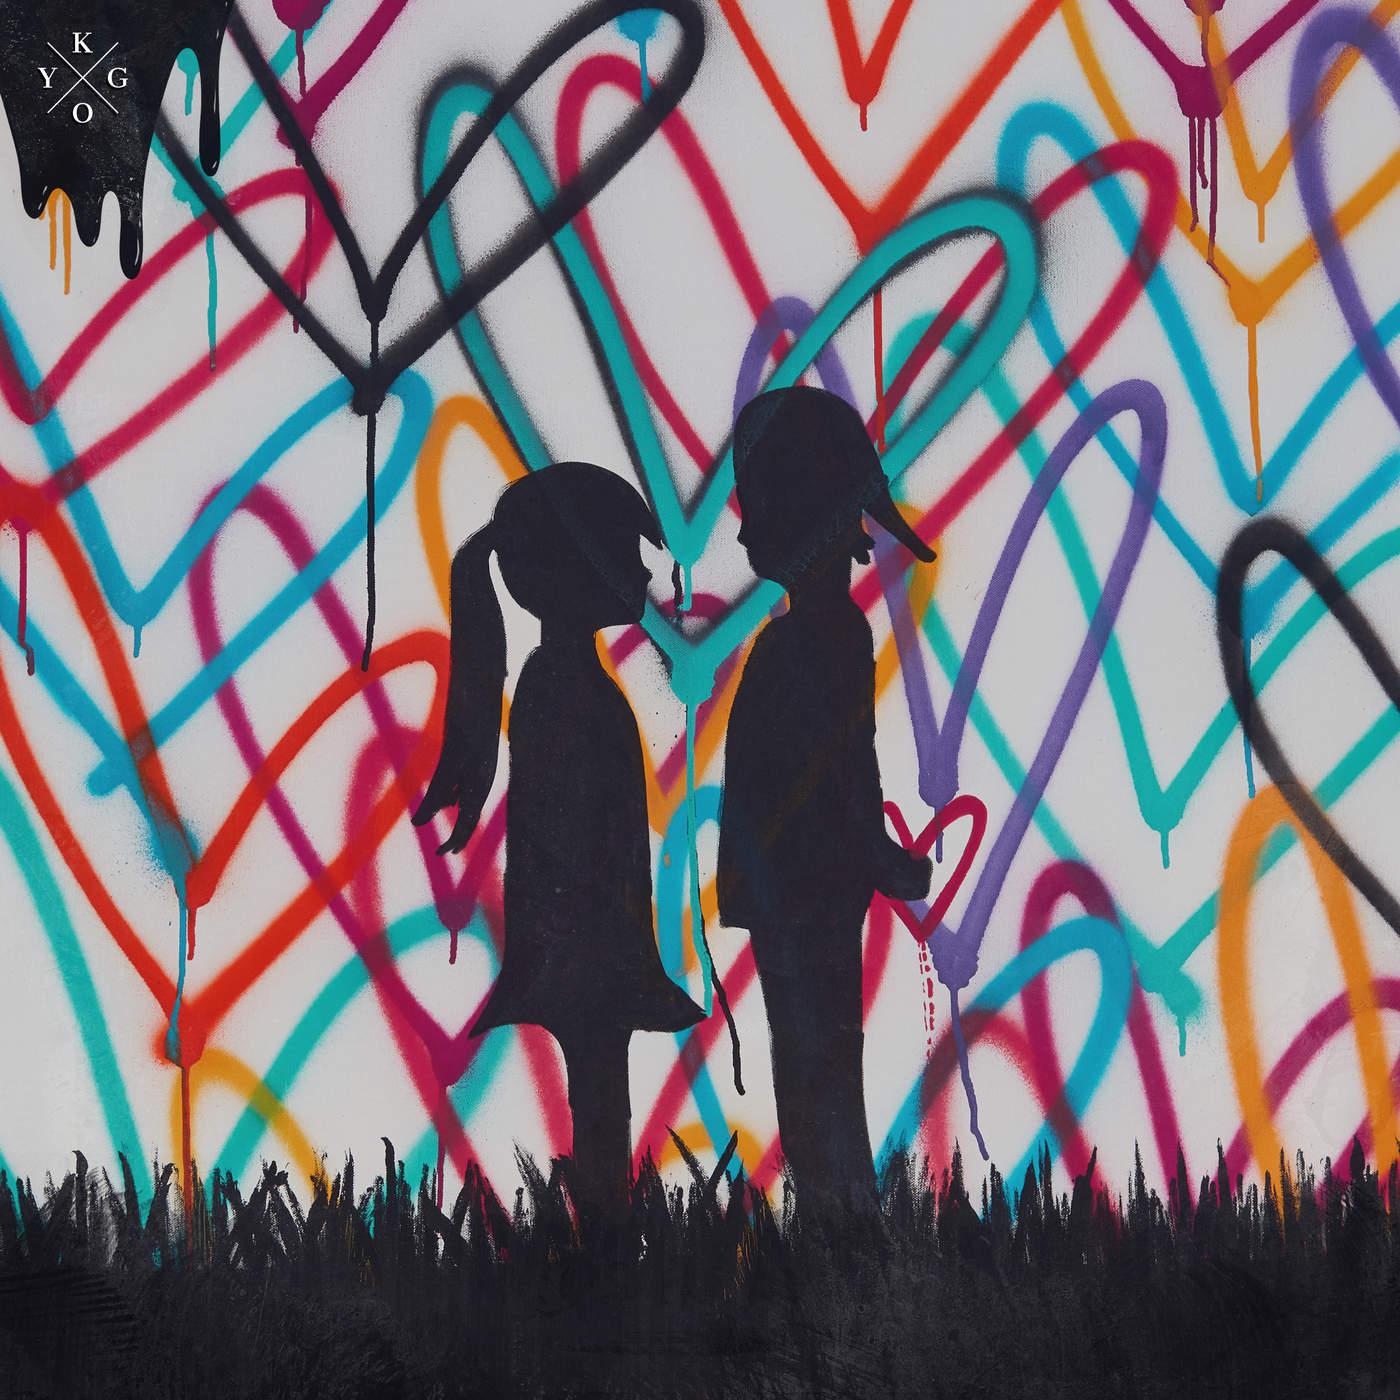 Kygo & Oliver Nelson - Riding Shotgun (feat. Bonnie McKee) - Single